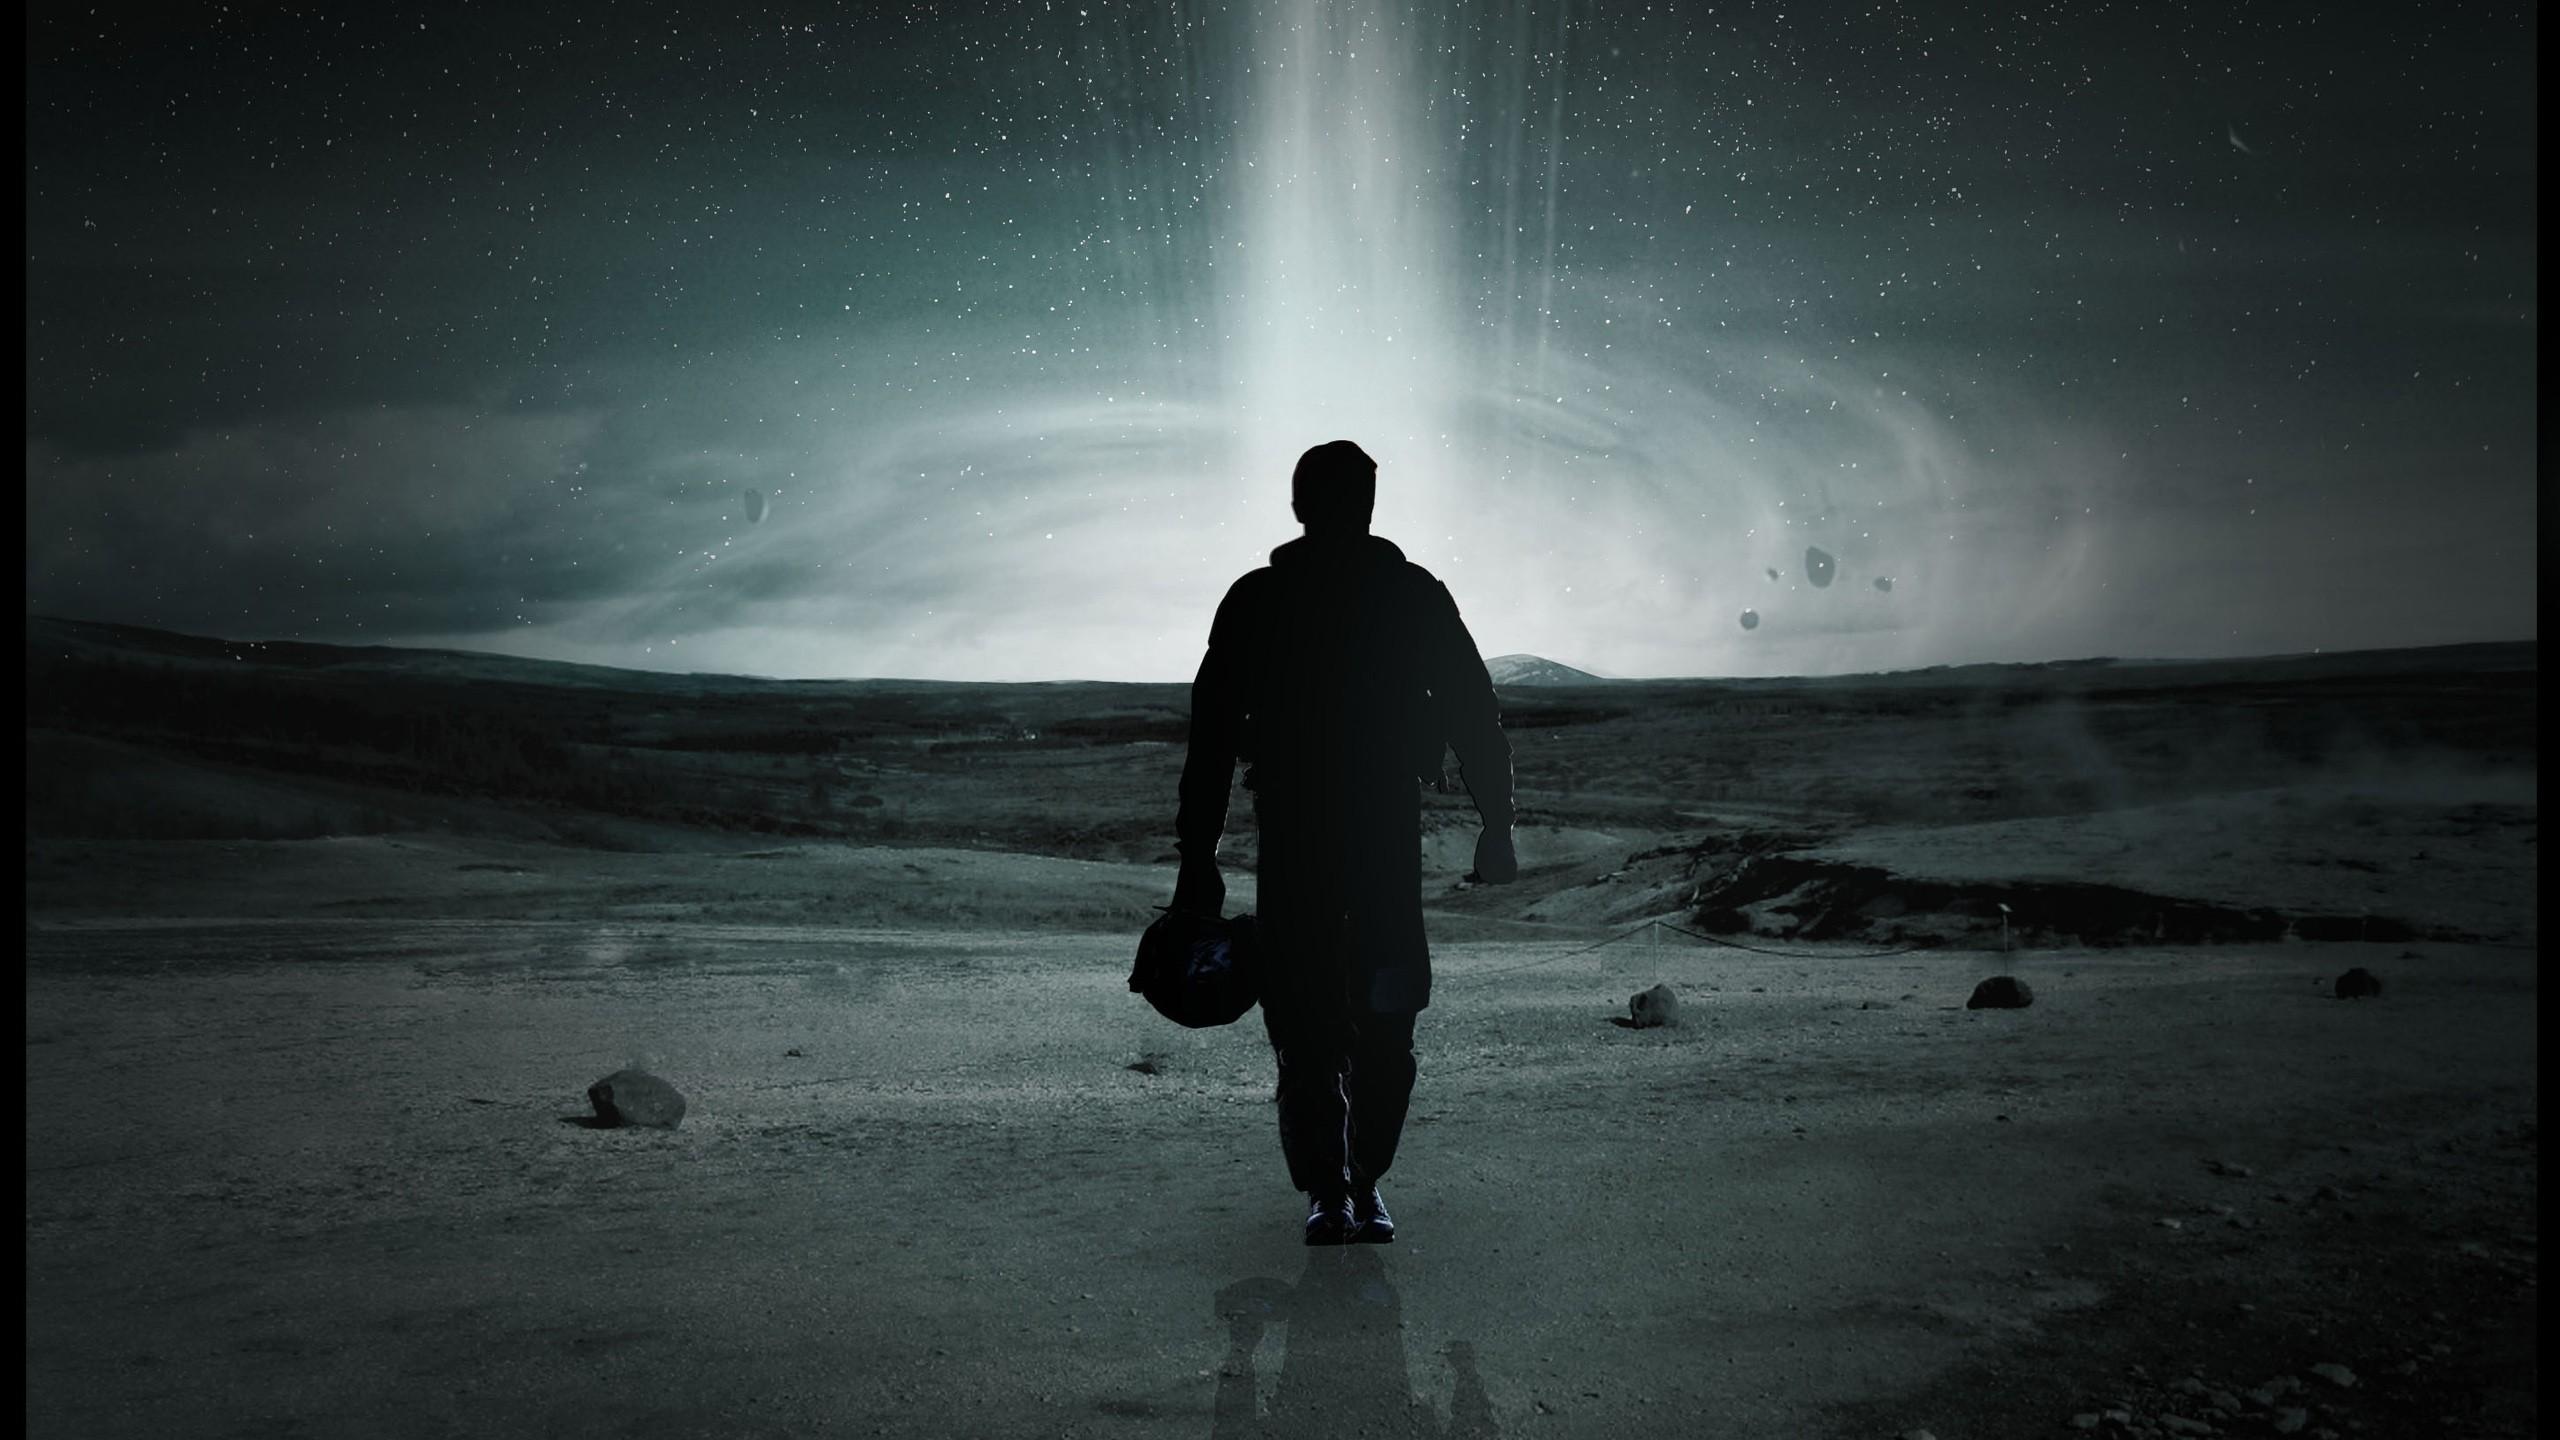 Black Hole Wallpaper Android Christopher Nolan S Interstellar Wallpapers Hd